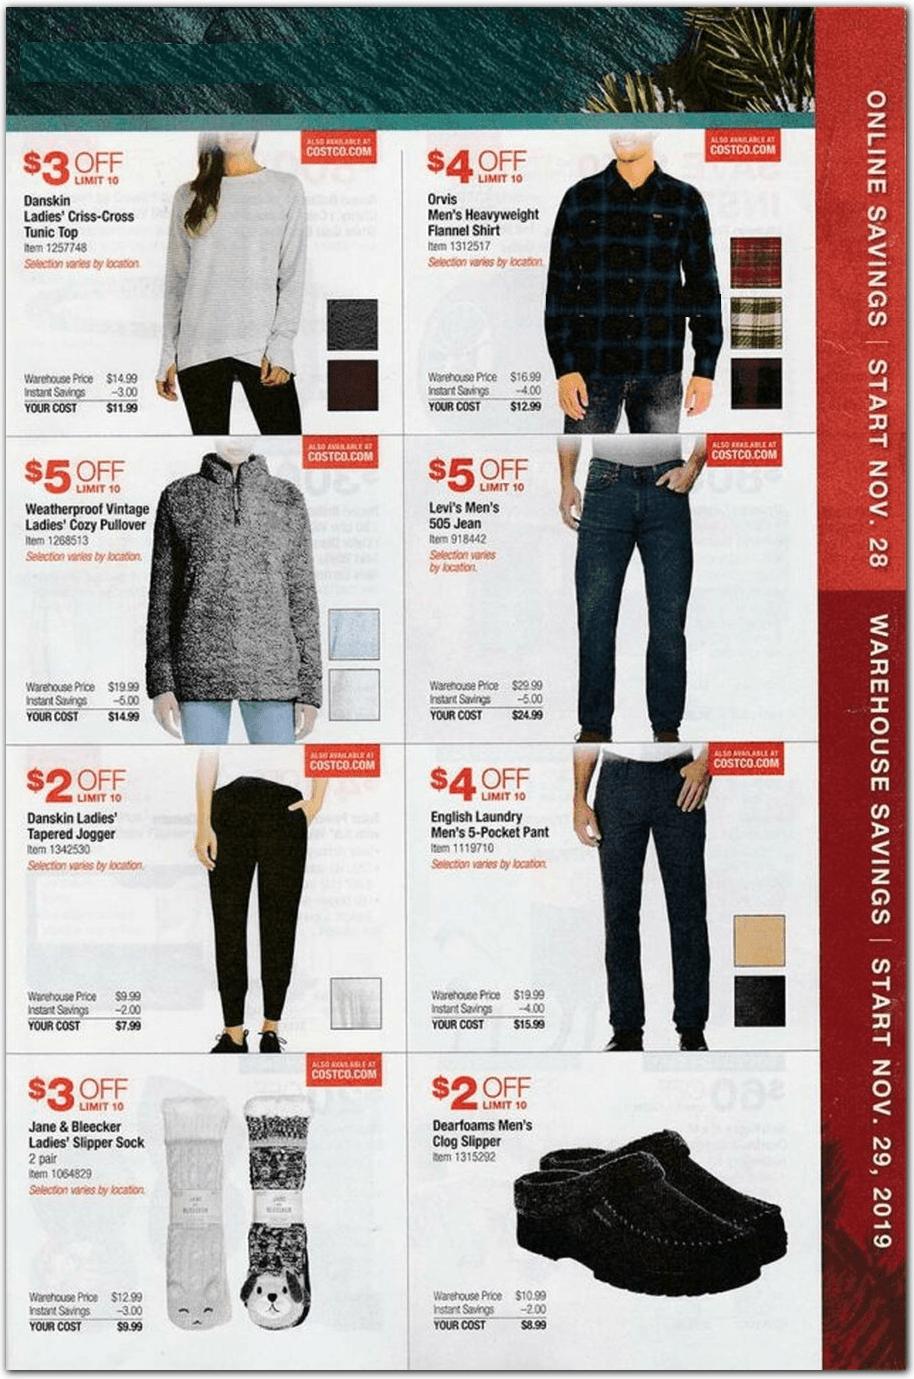 Costco Black Friday 2019 Page 21